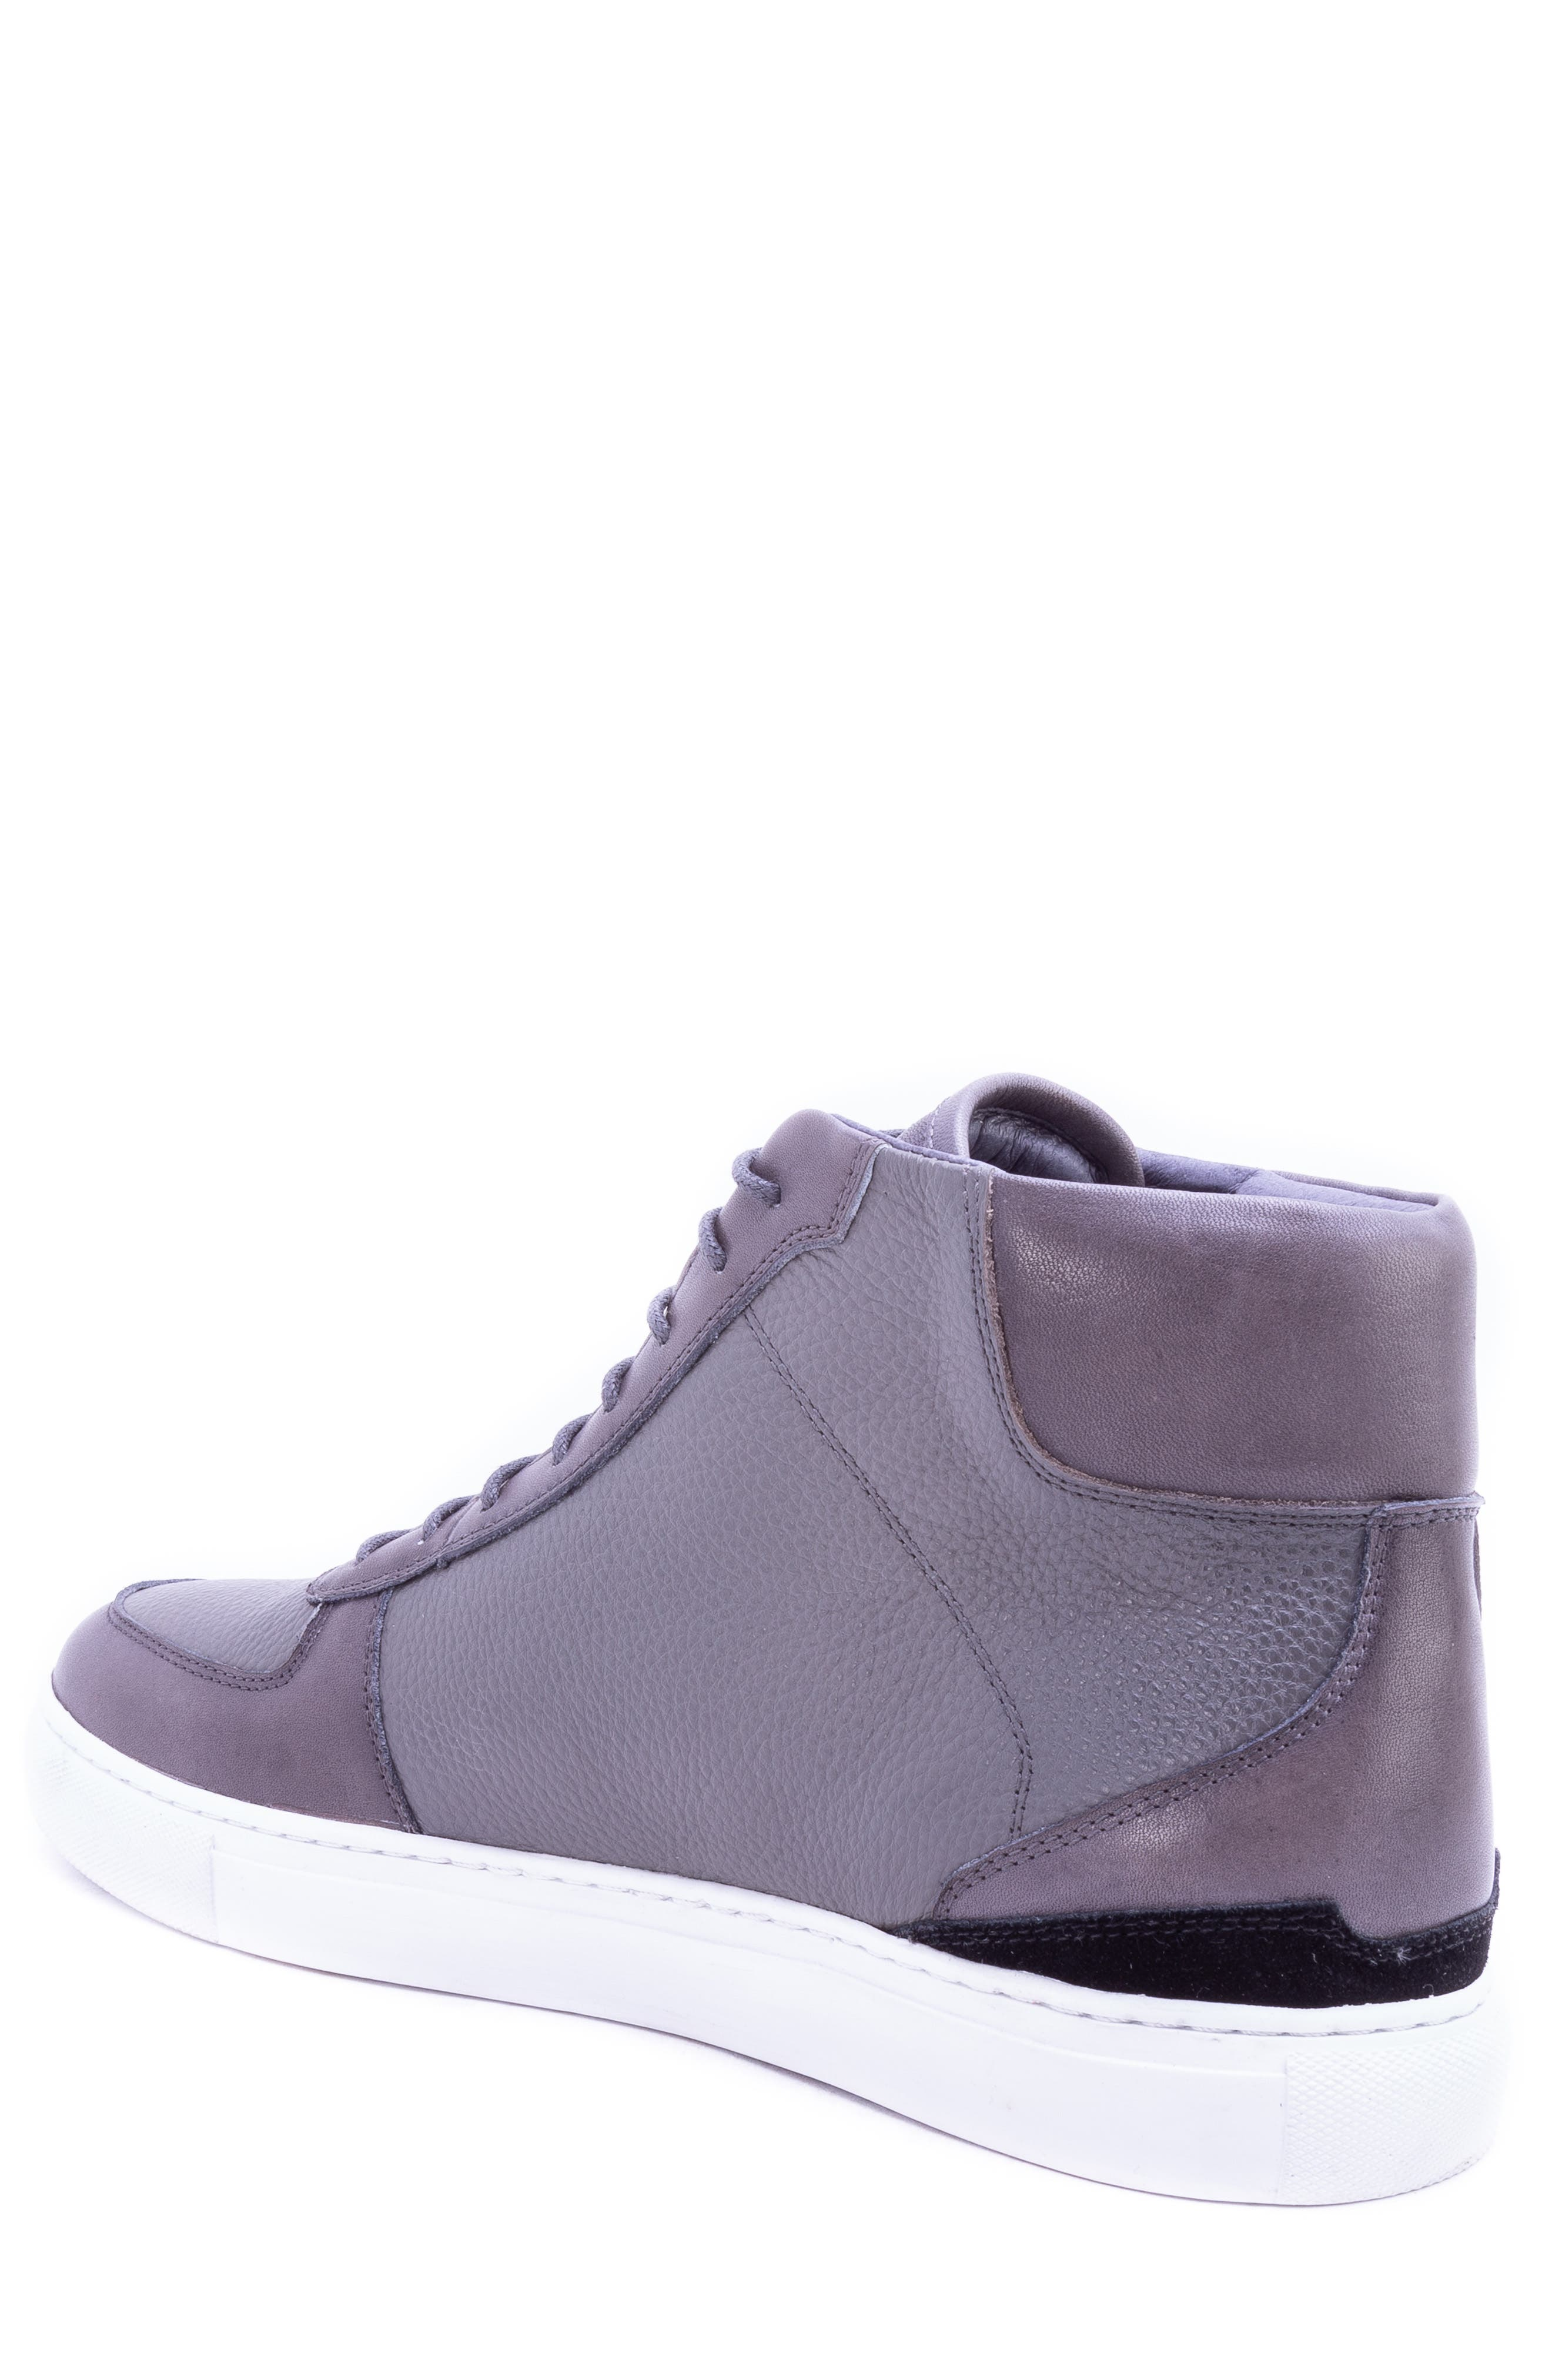 Tassel High Top Sneaker,                             Alternate thumbnail 2, color,                             GREY LEATHER